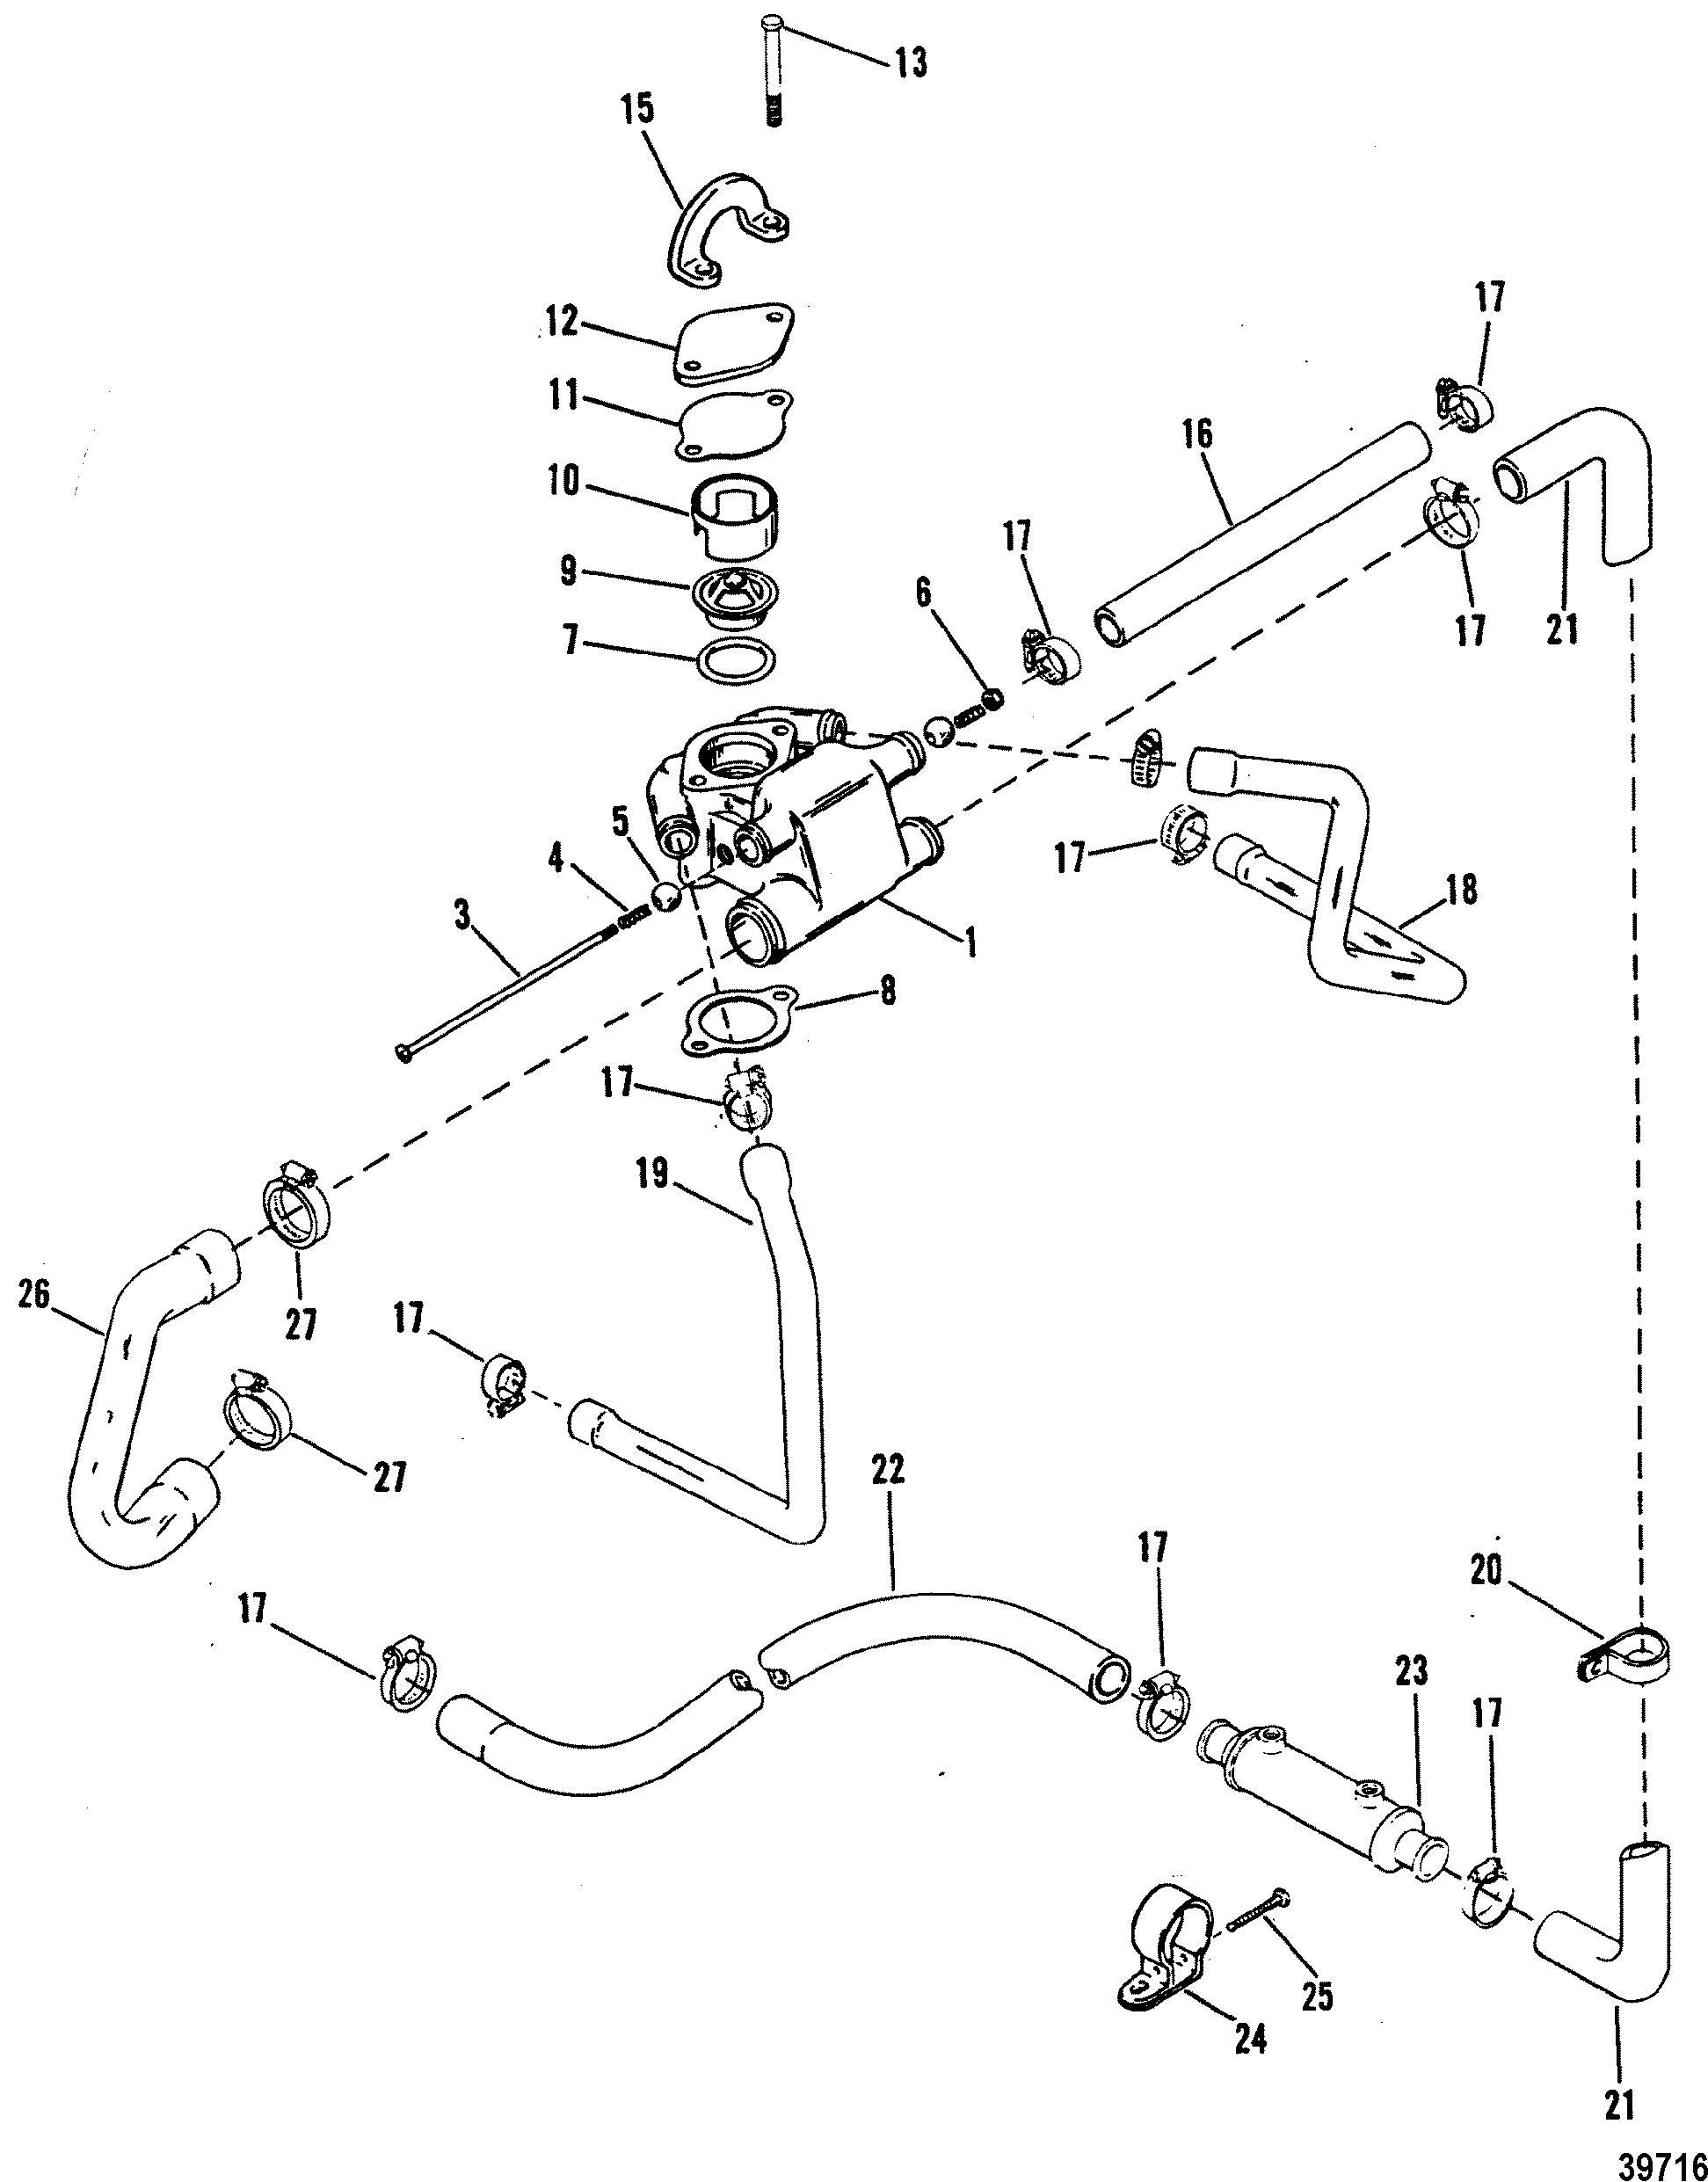 Standard Cooling System For Mercruiser 4 3l 4 3lx Alpha